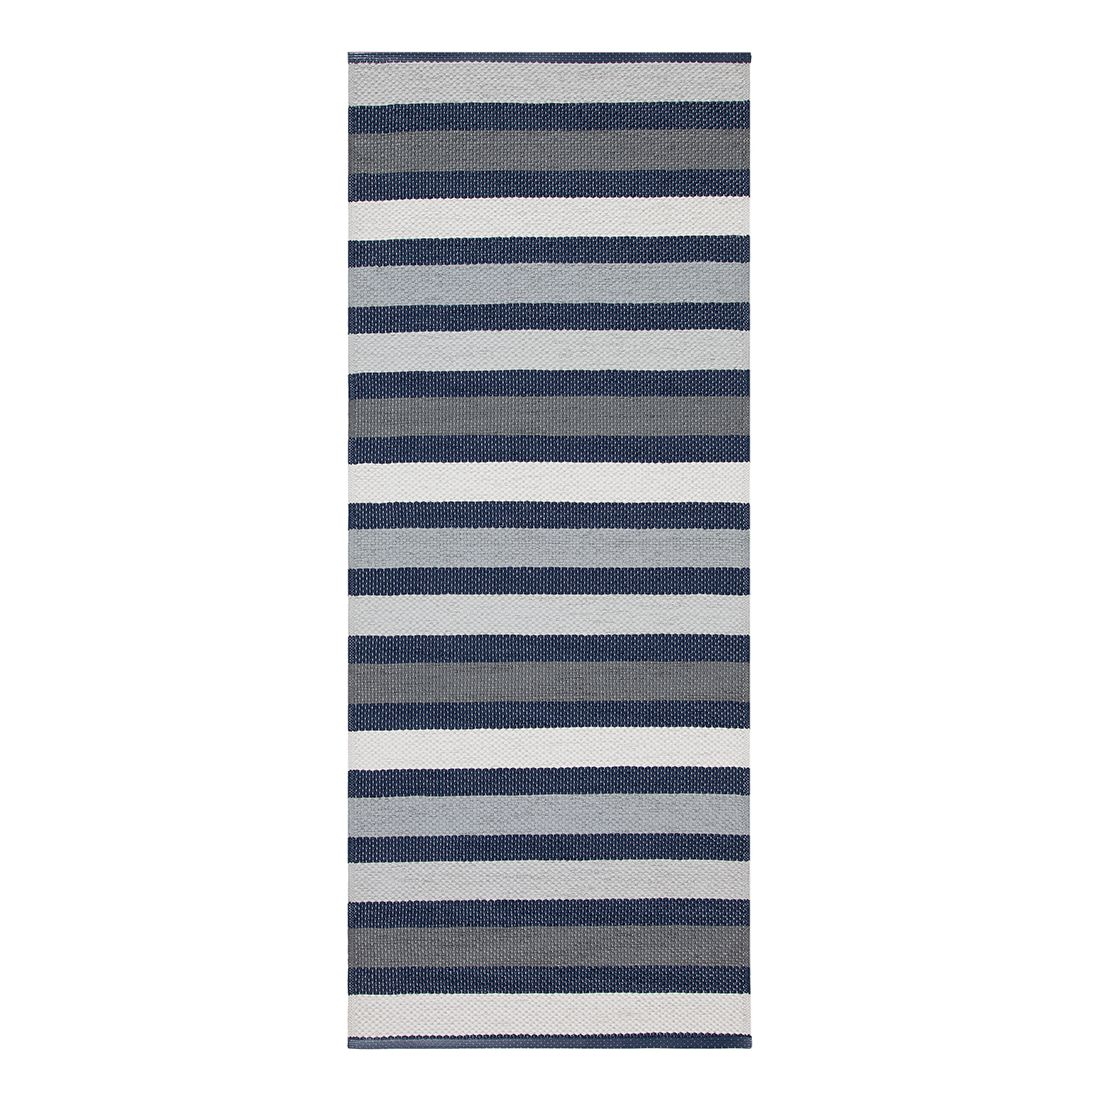 In-/Outdoorteppich Baia I – Kunstfaser MarineBlau/Grau/KaltWeiß – 60 x 200 cm, Swedy jetzt kaufen